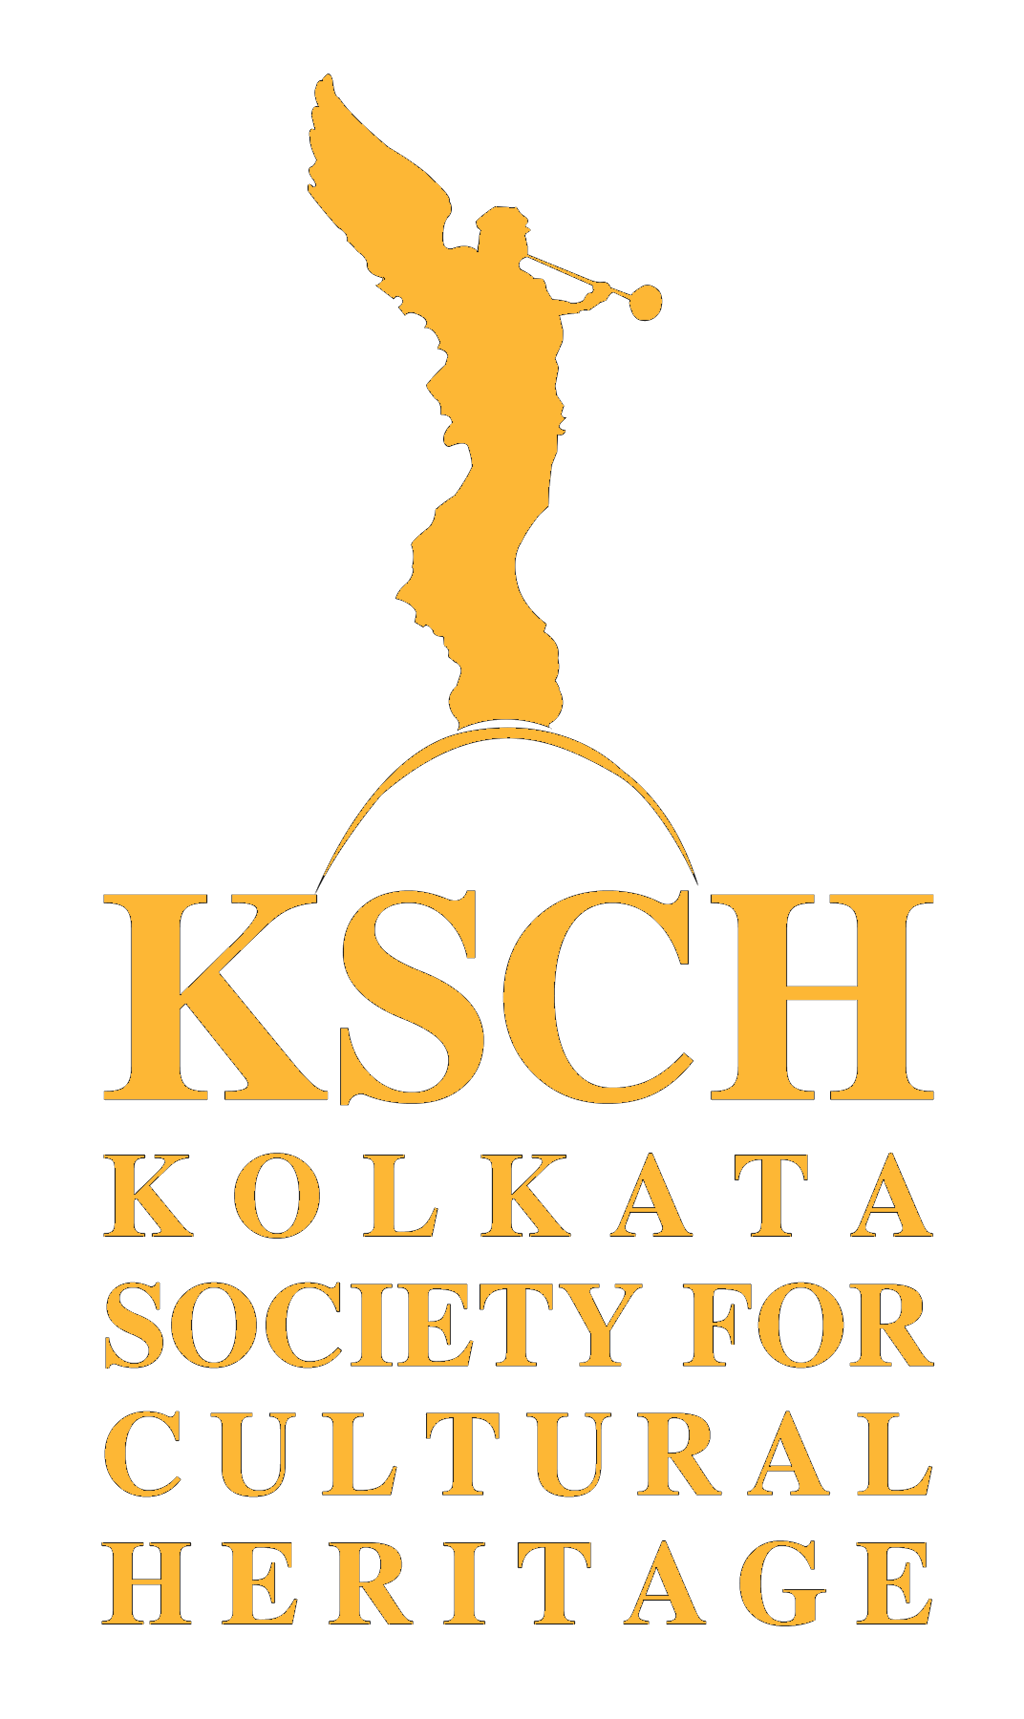 Kolkata Society for Cultural Heritage